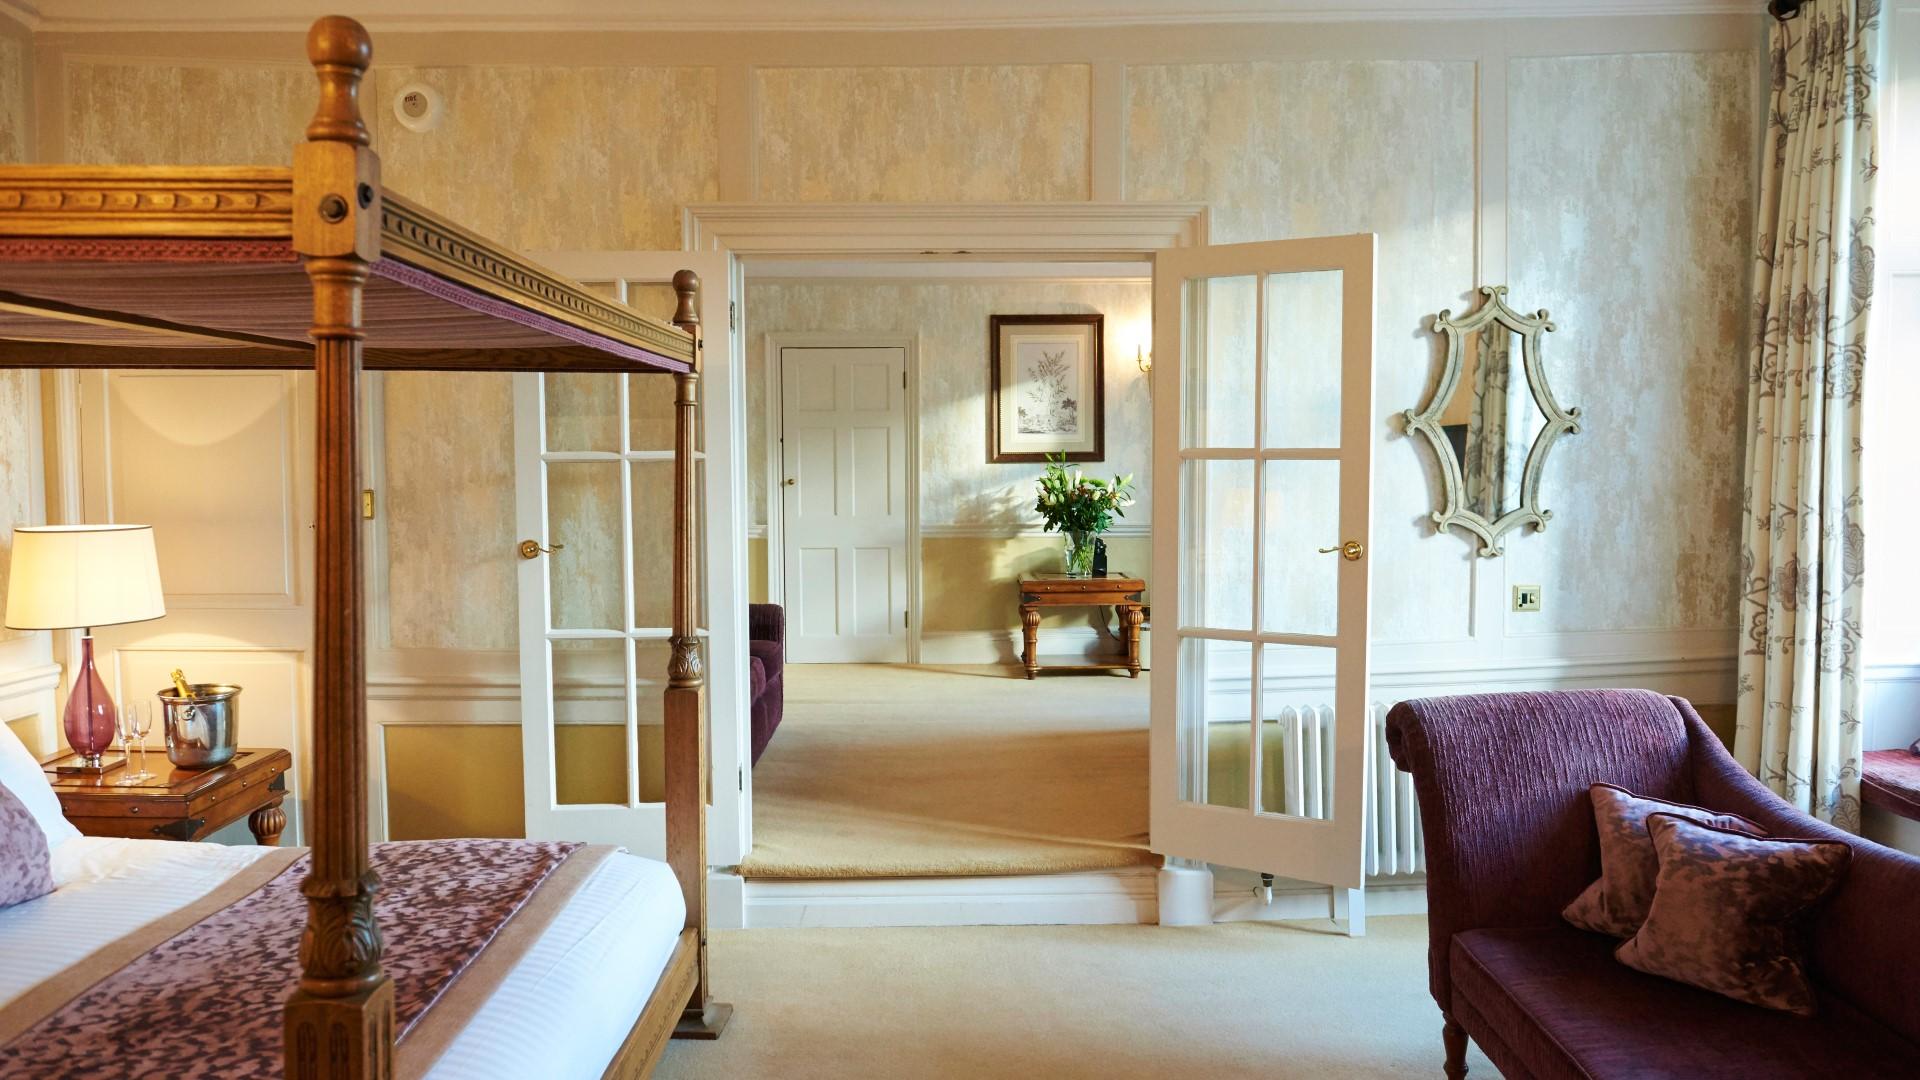 The Hotel Review |  Buckland St Tout | Devon | UK